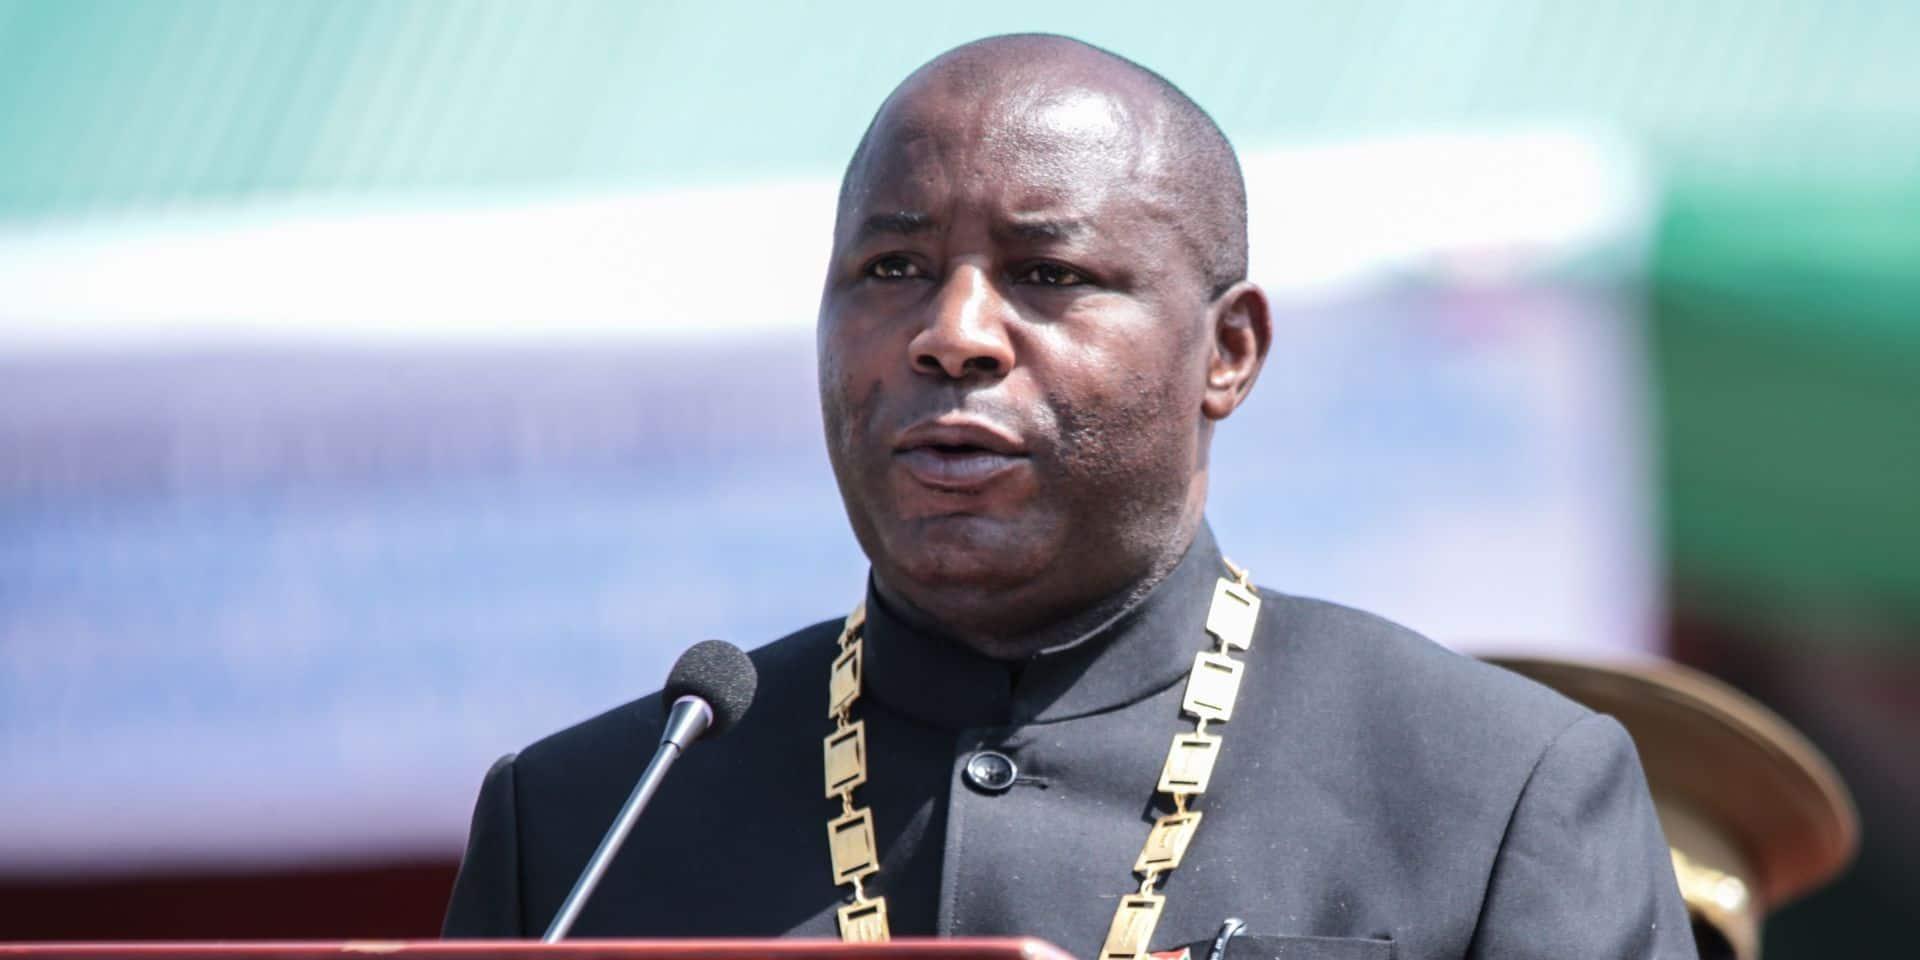 Révérien Ndikuriyo remplace le général Evariste Ndayishimiye (photo), qui est président du Burundi depuis 2020.